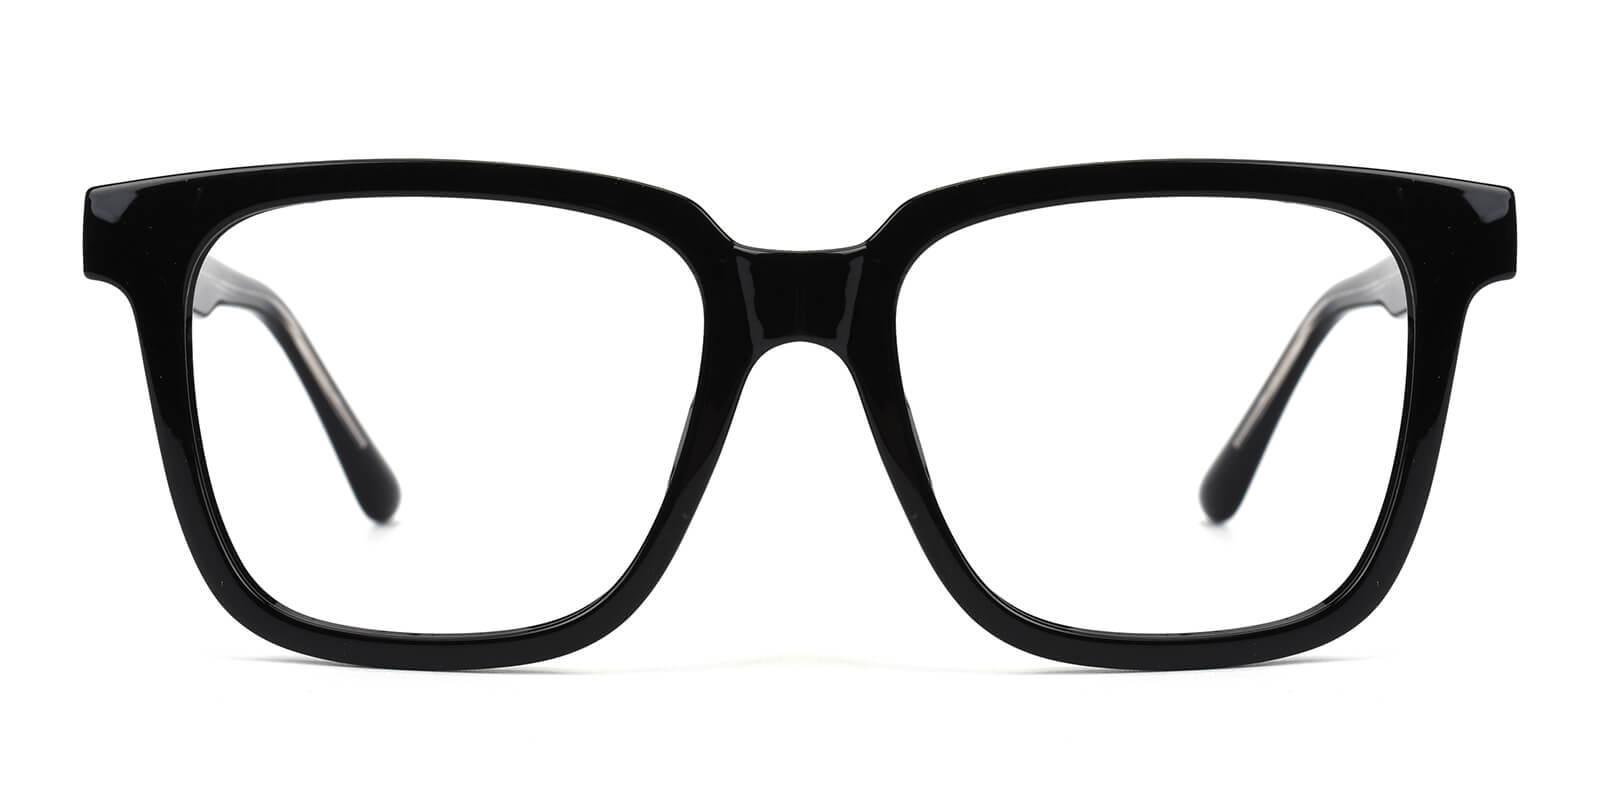 Jadeite-Black-Square-Acetate-Eyeglasses-additional2